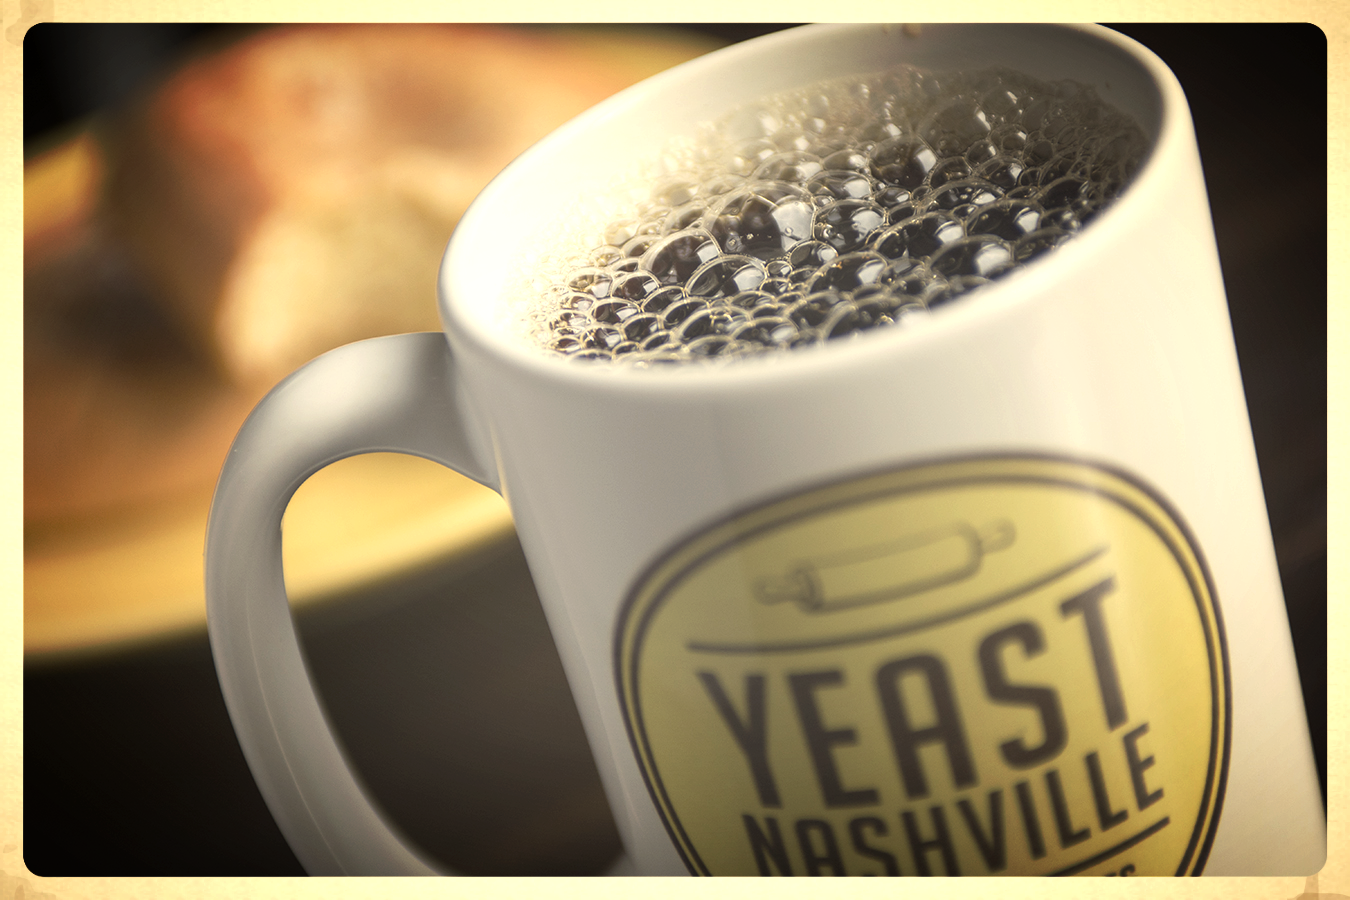 Yeast Nashville